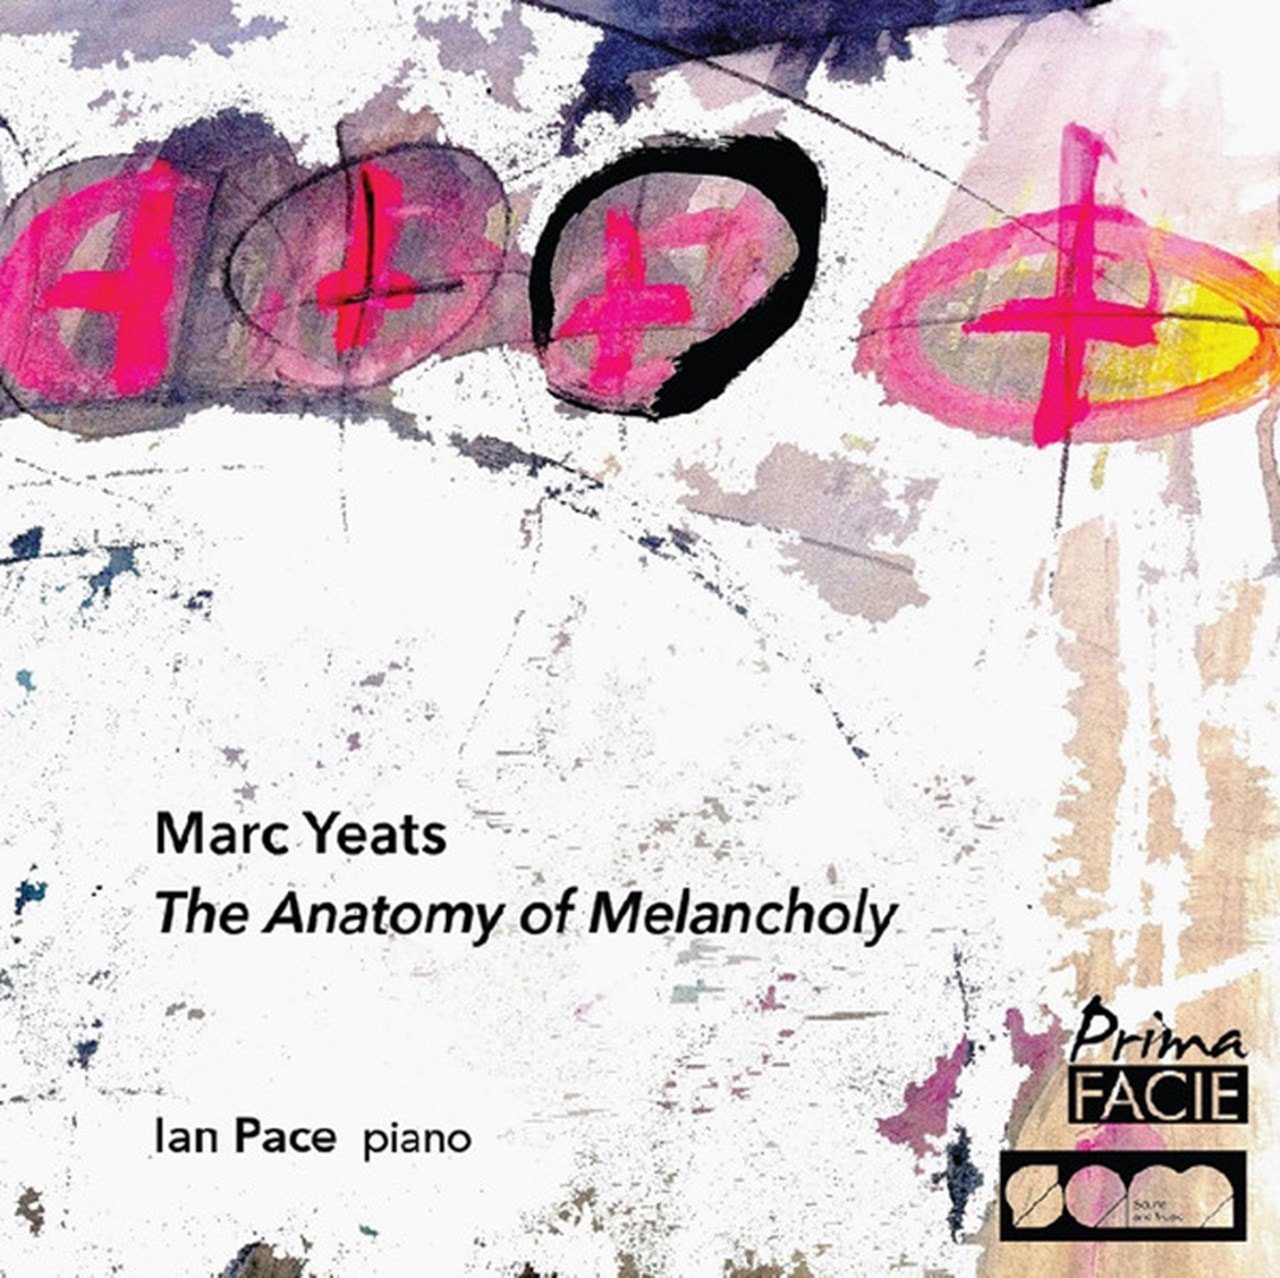 Marc Yeats: The Anatomy of Melancholy - 1